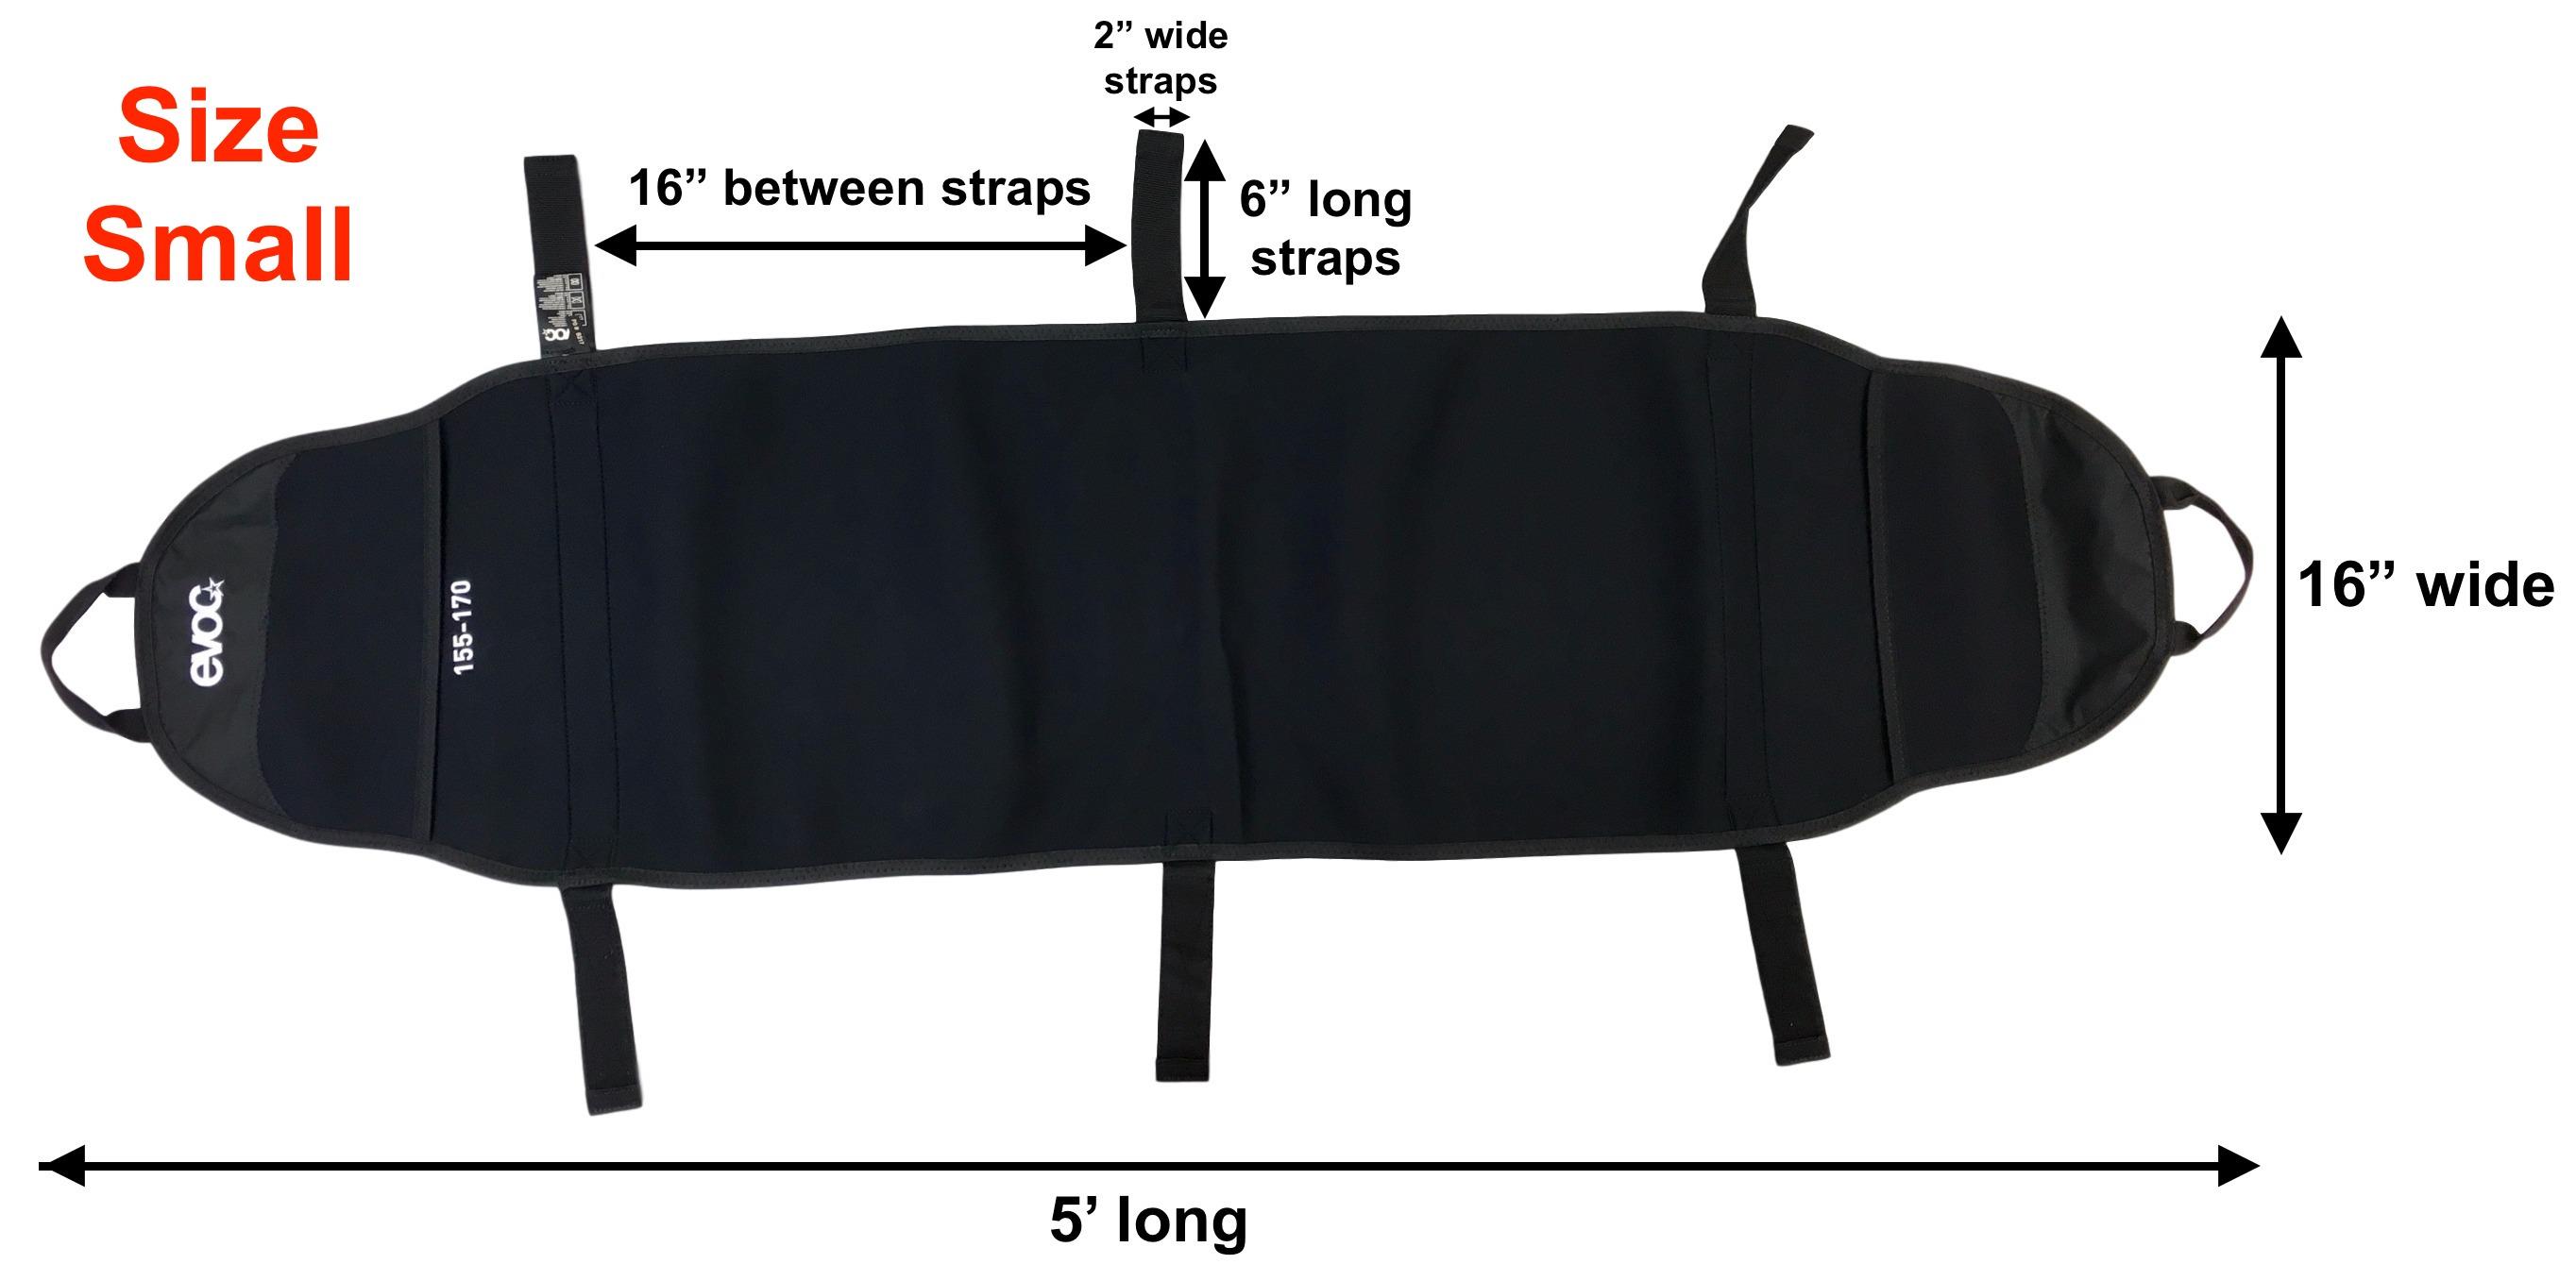 small-snowboard-cover-dimensions.jpeg